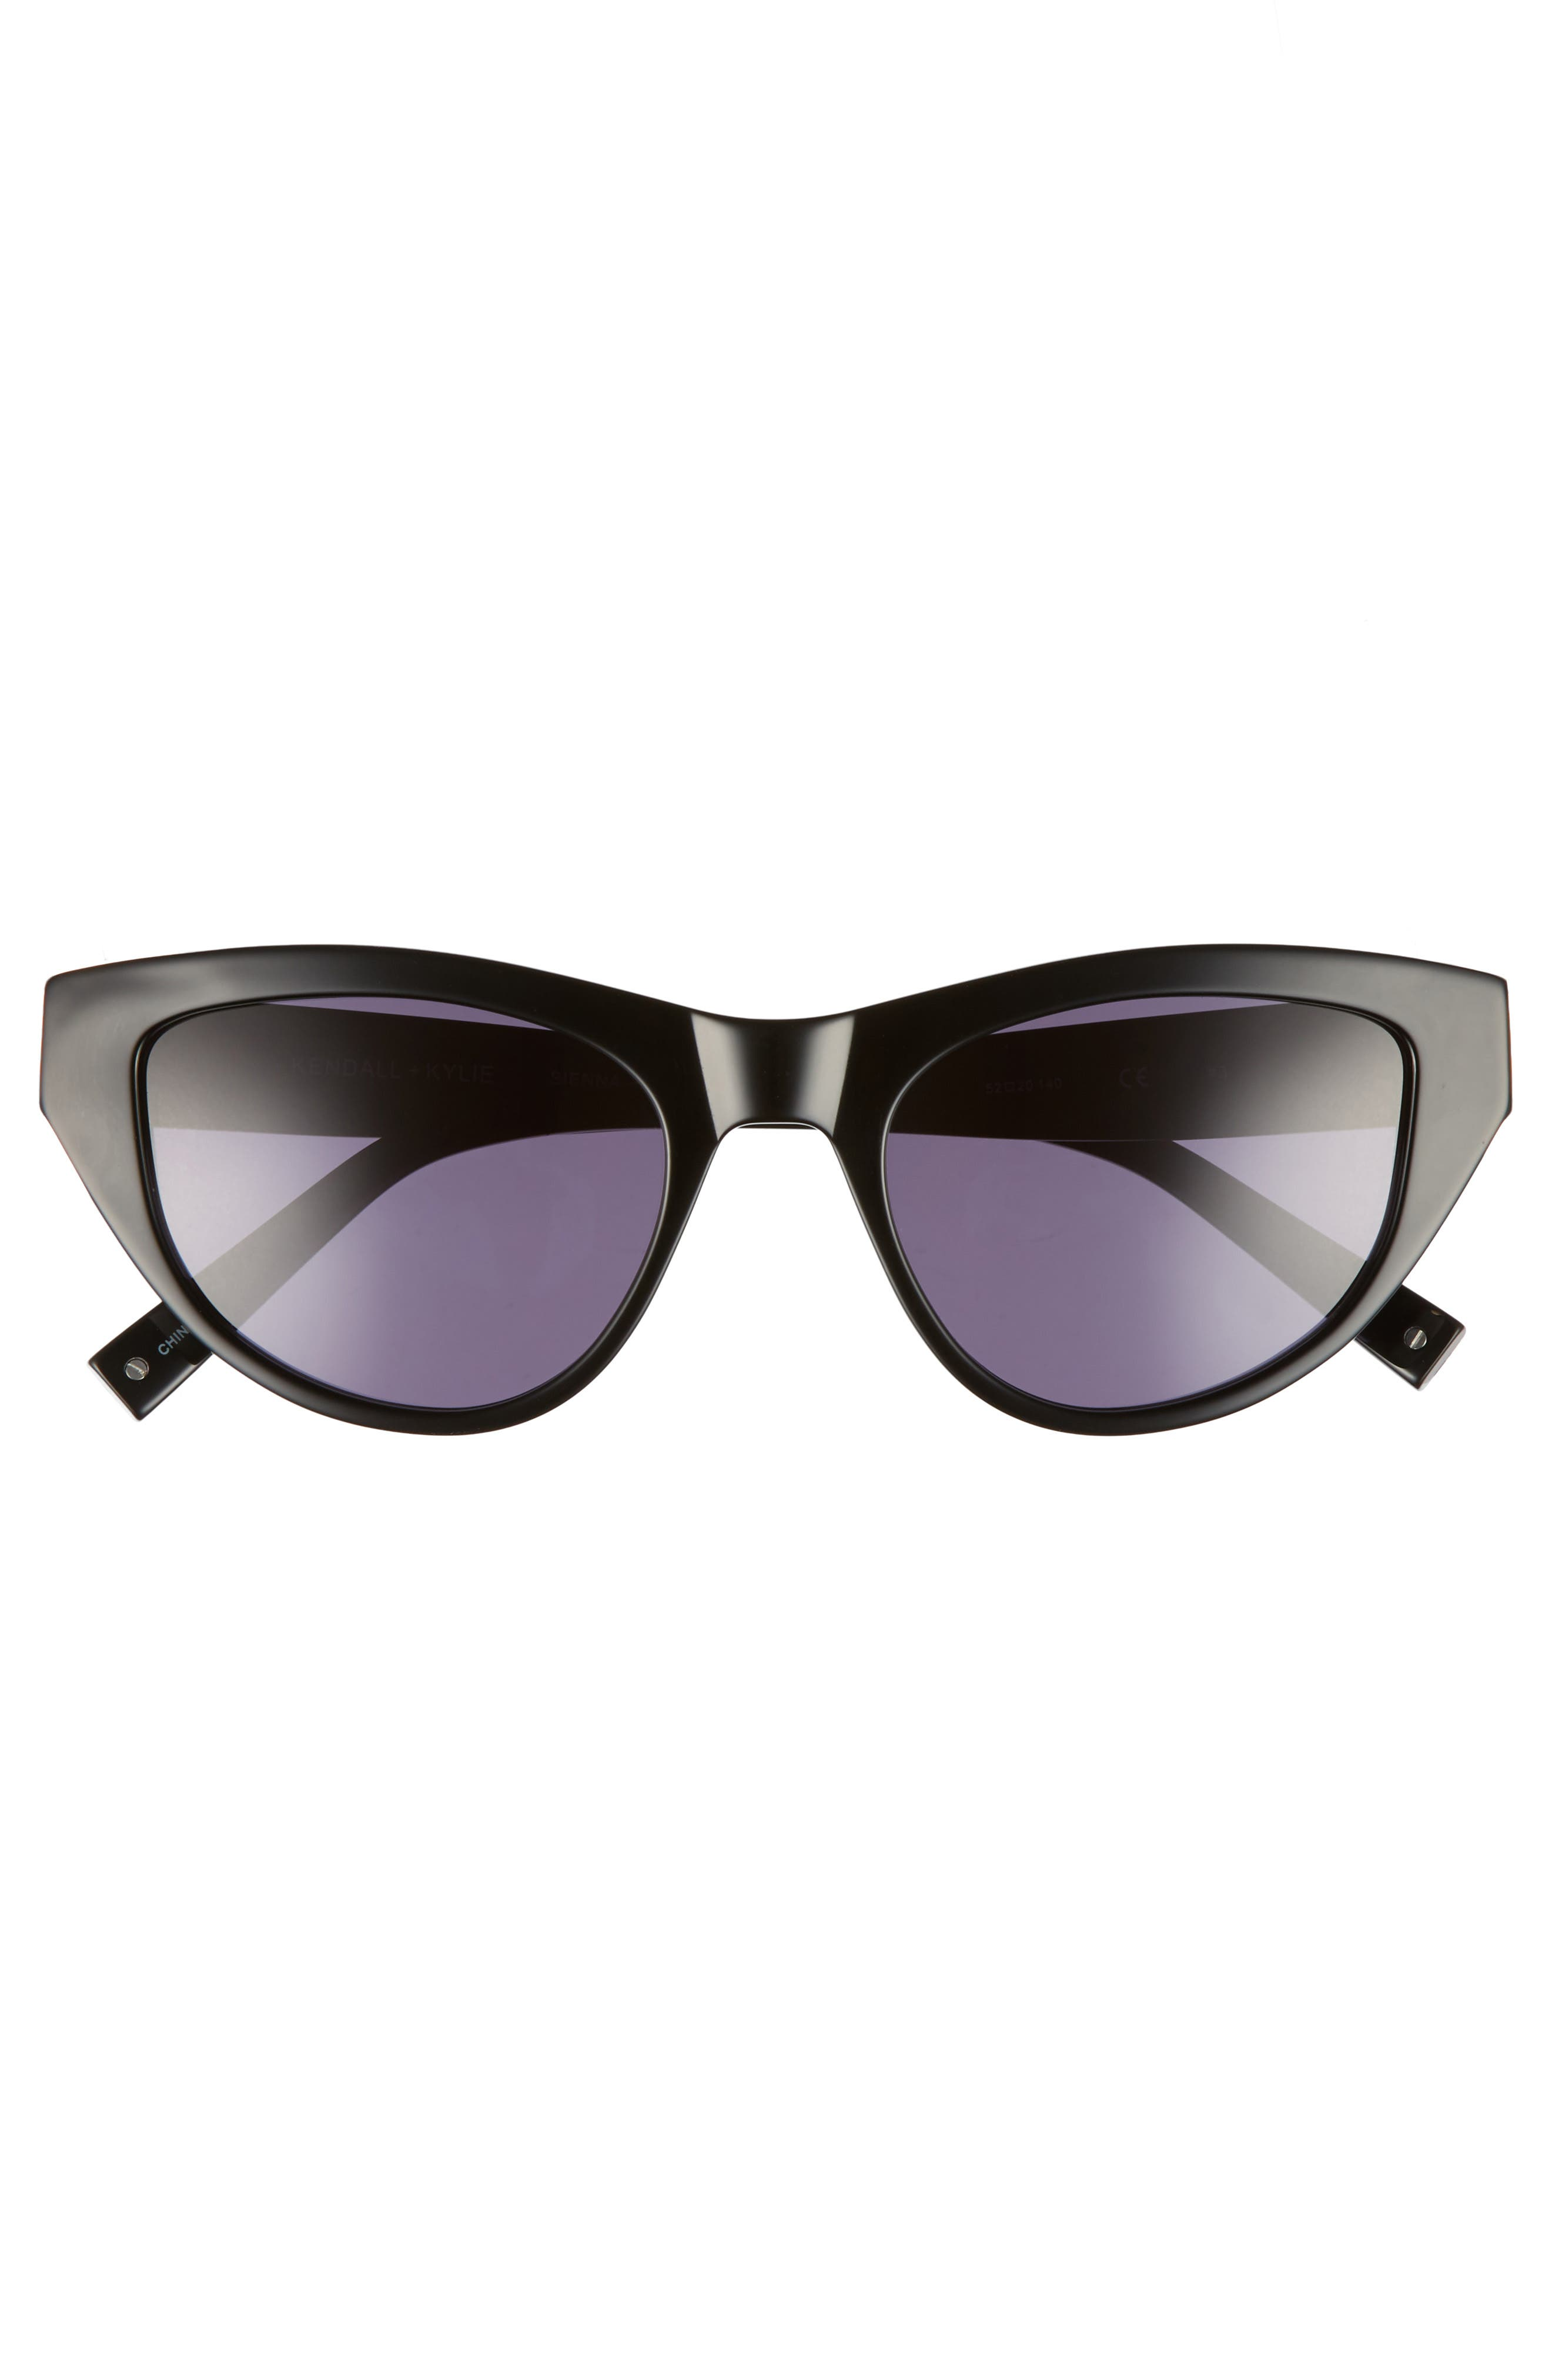 Sienna 52mm Retro Cat Eye Sunglasses,                             Alternate thumbnail 8, color,